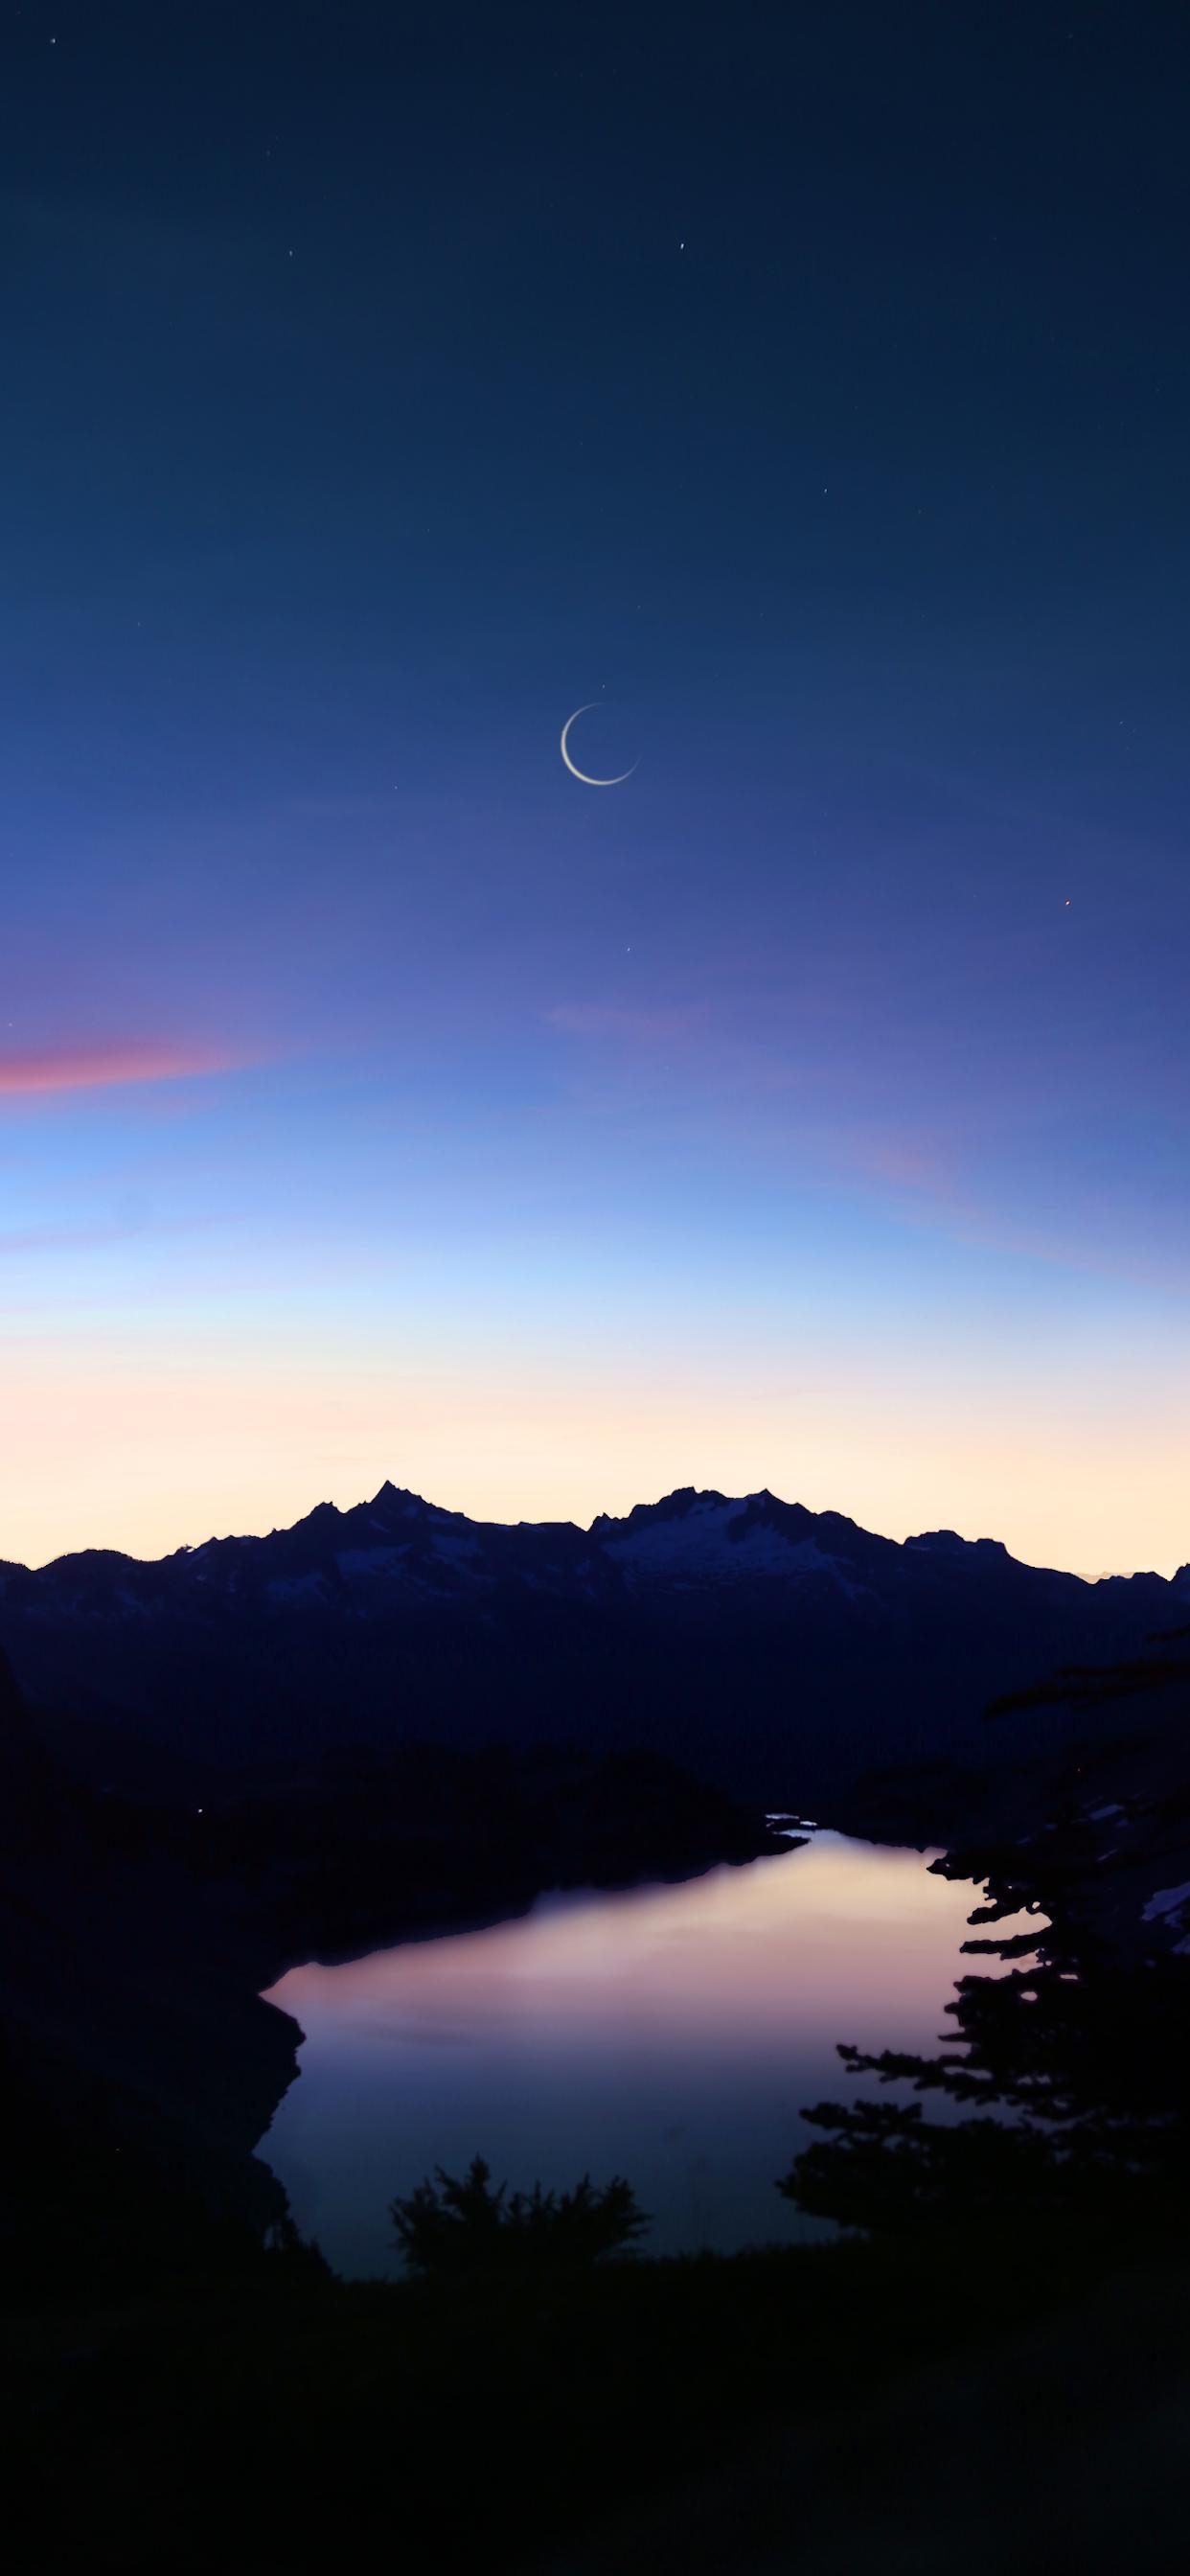 iPhone wallpapers moon hidden lake Fonds d'écran iPhone du 19/02/2020